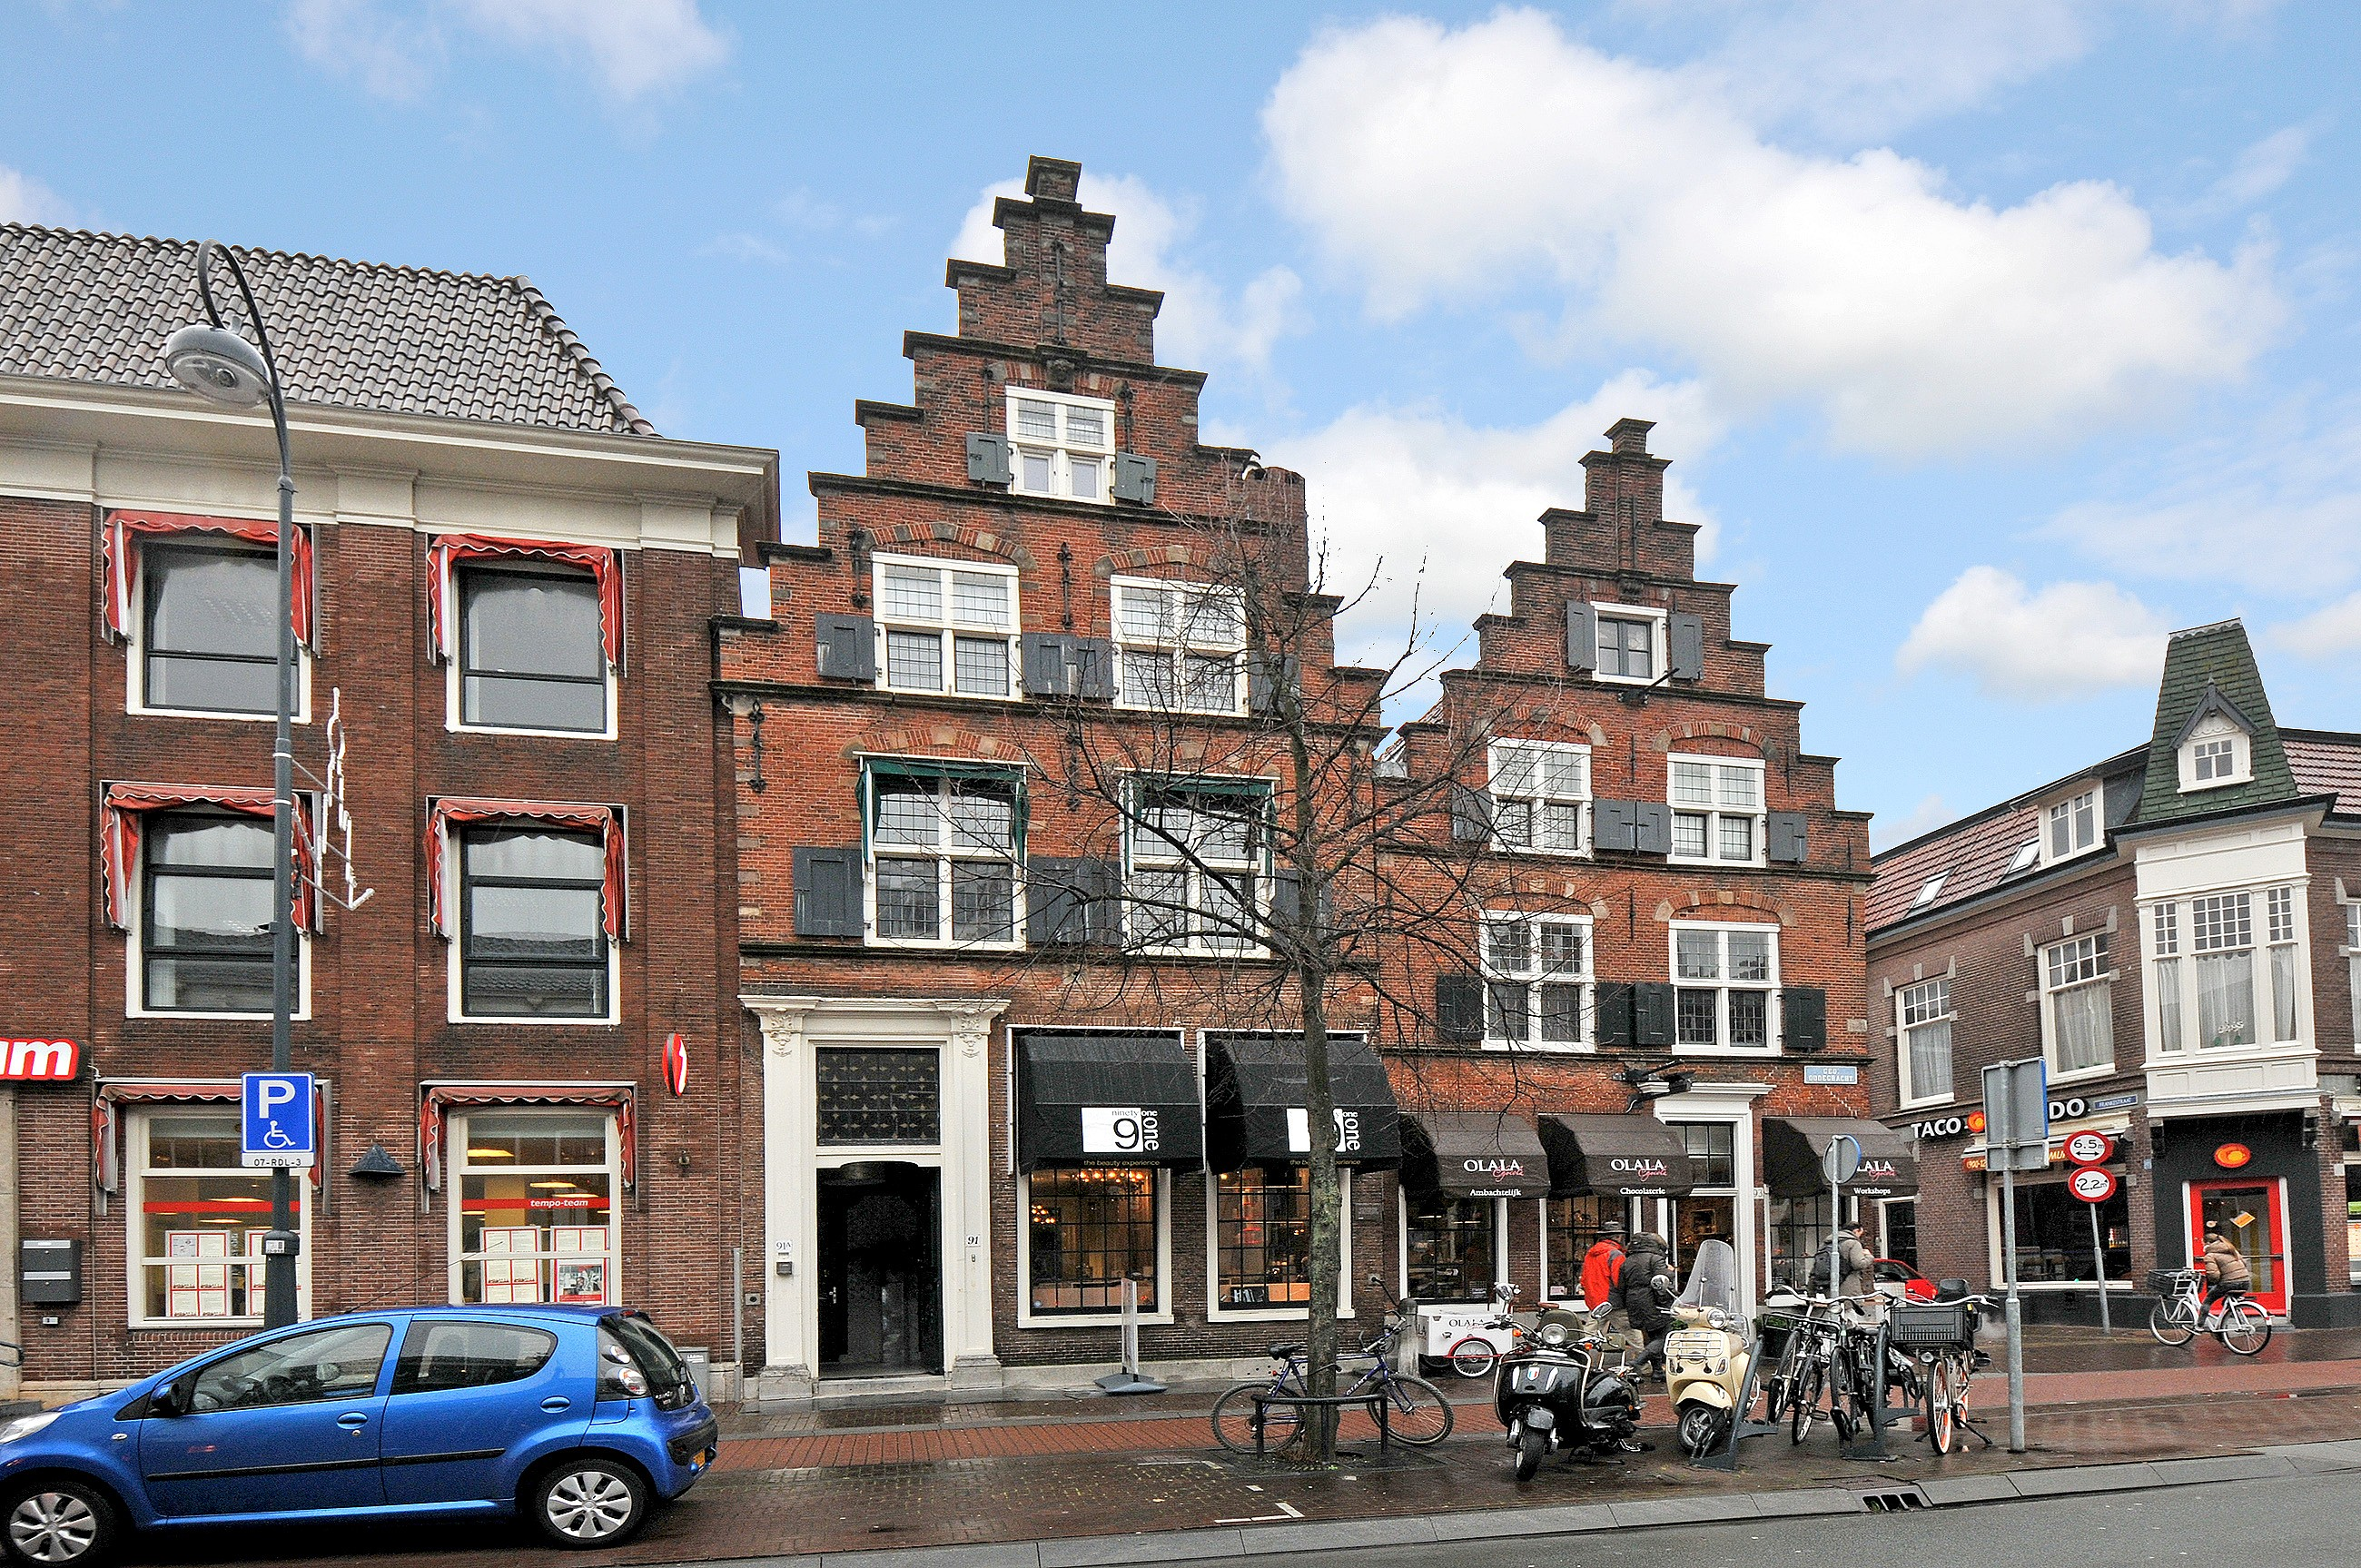 Aerdenburgh Holding verkoopt objecten in Haarlem